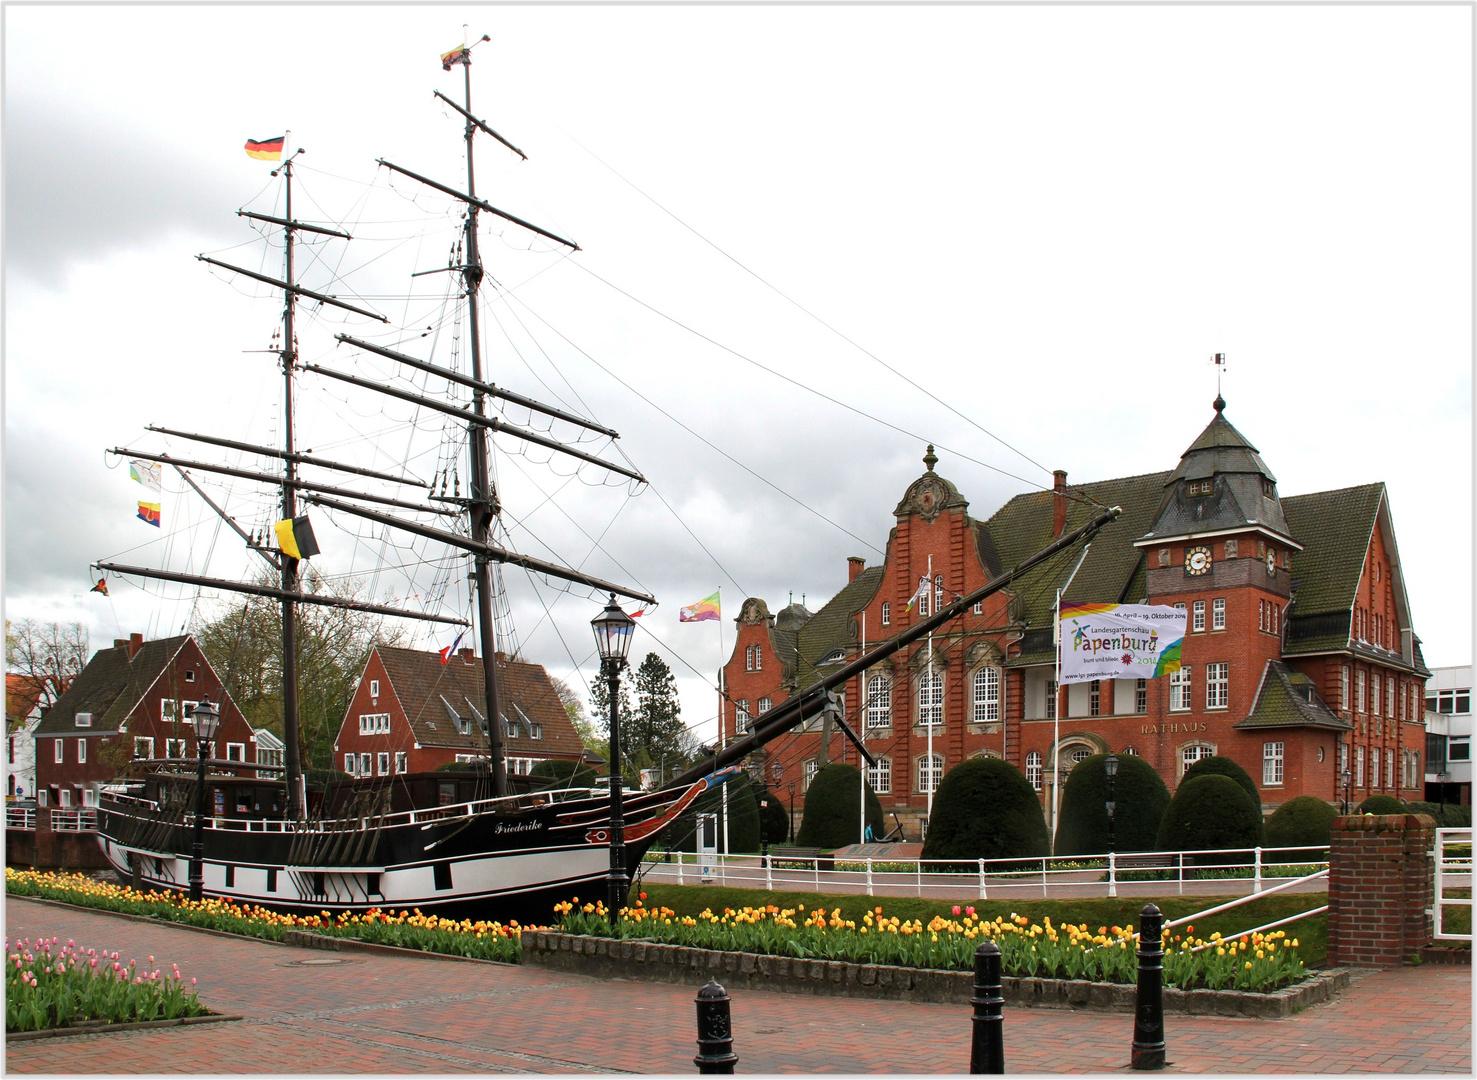 Papenburg an der Ems ... das Rathaus